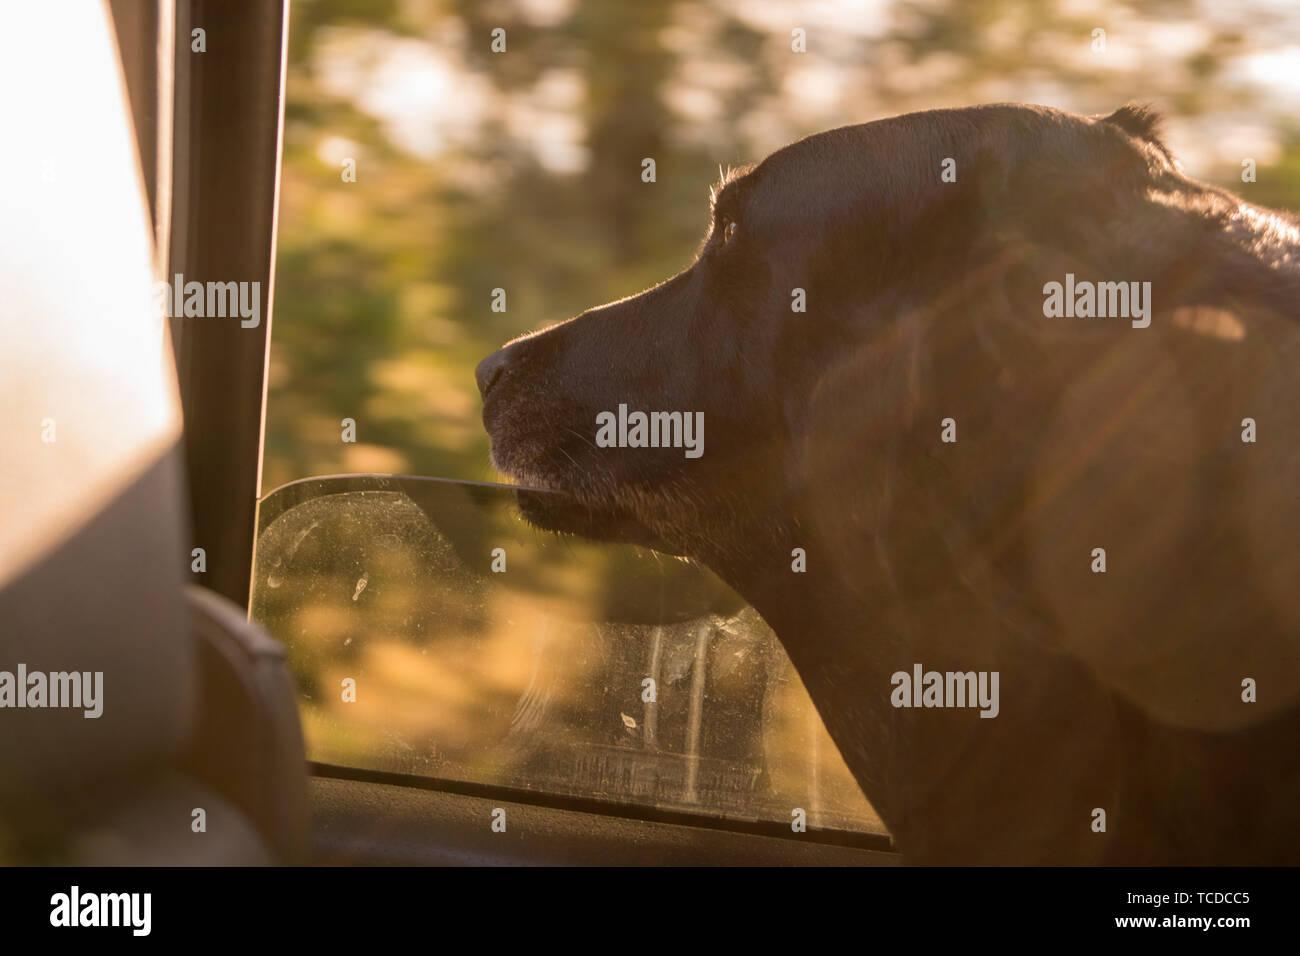 Black Labrador retriever dog with head out of car window. - Stock Image